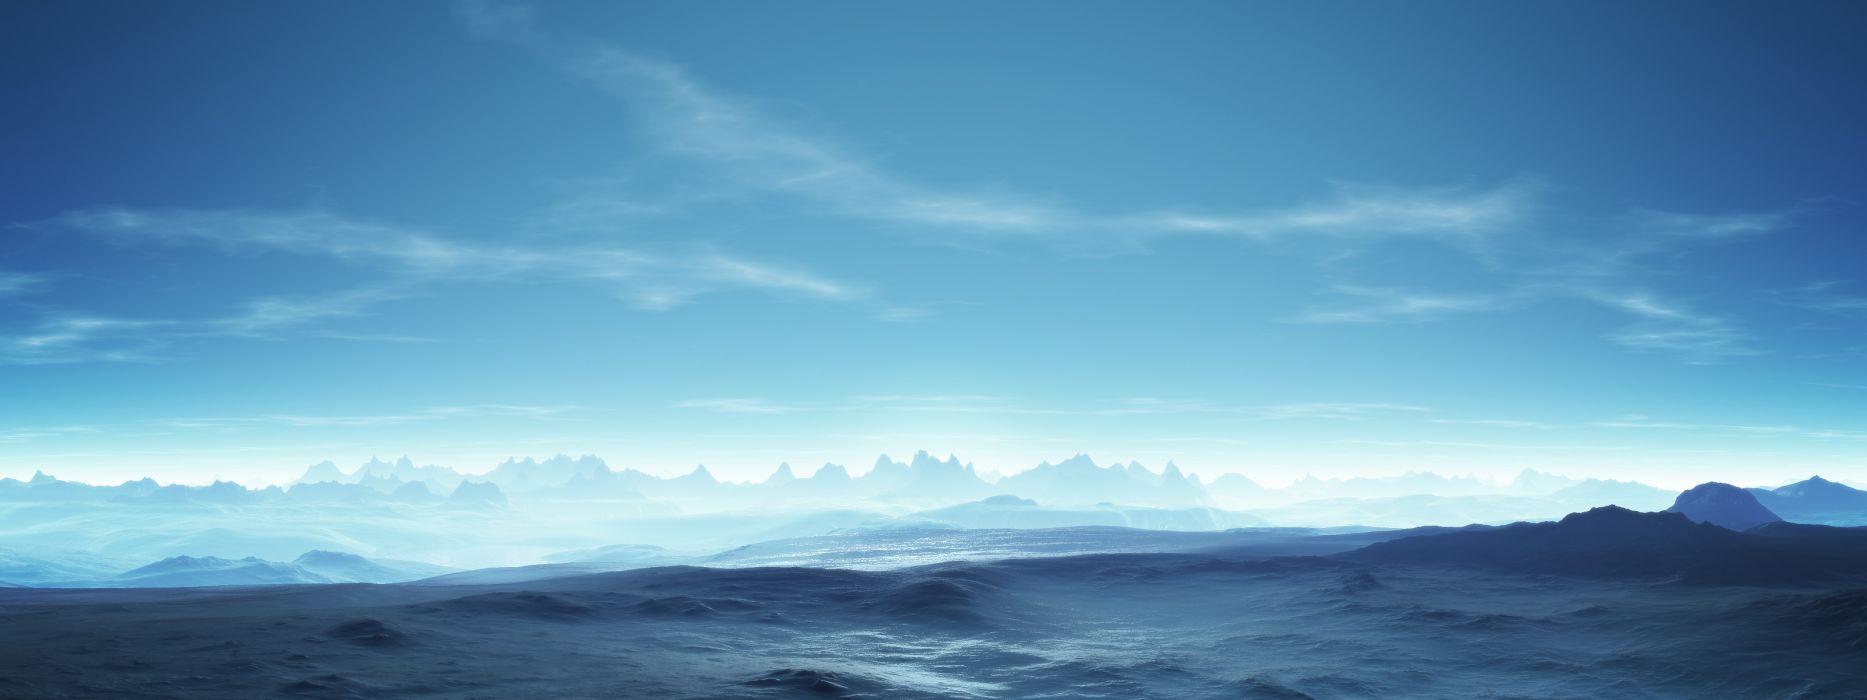 Mountains clouds landscapes digital art wallpaper